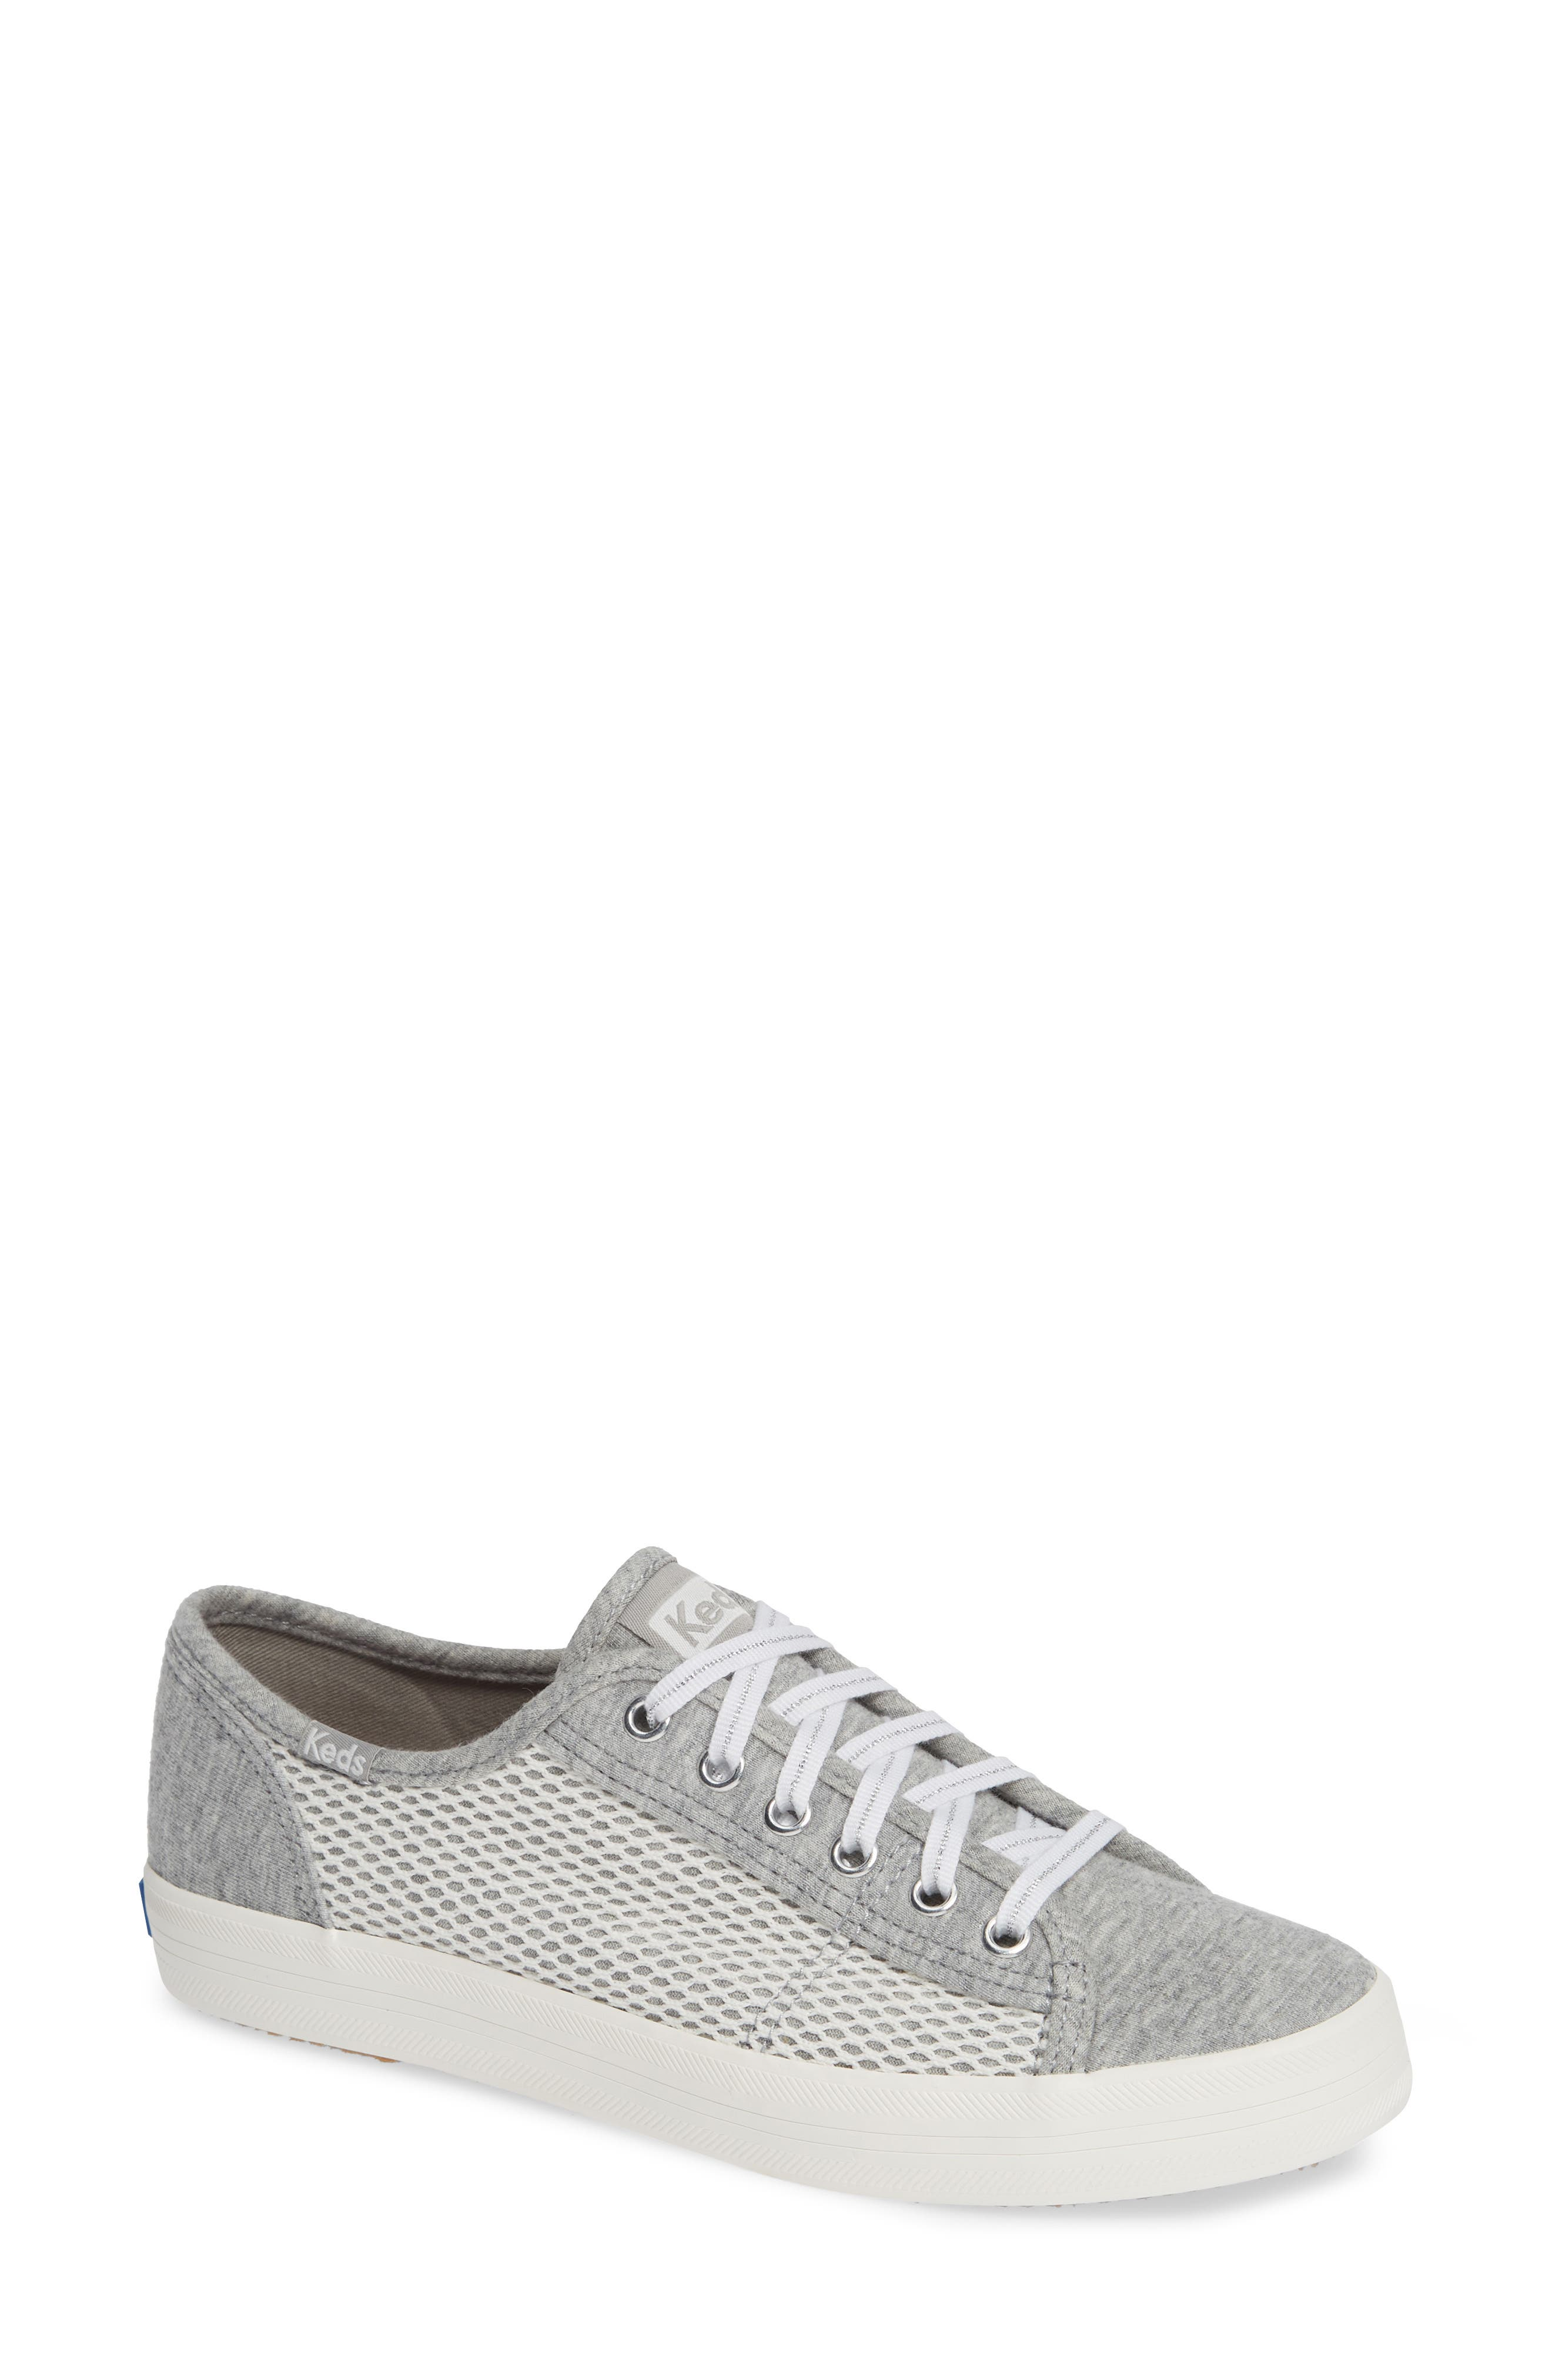 KEDS<SUP>®</SUP> Kickstart Mesh & Jersey Sneaker, Main, color, LIGHT GRAY